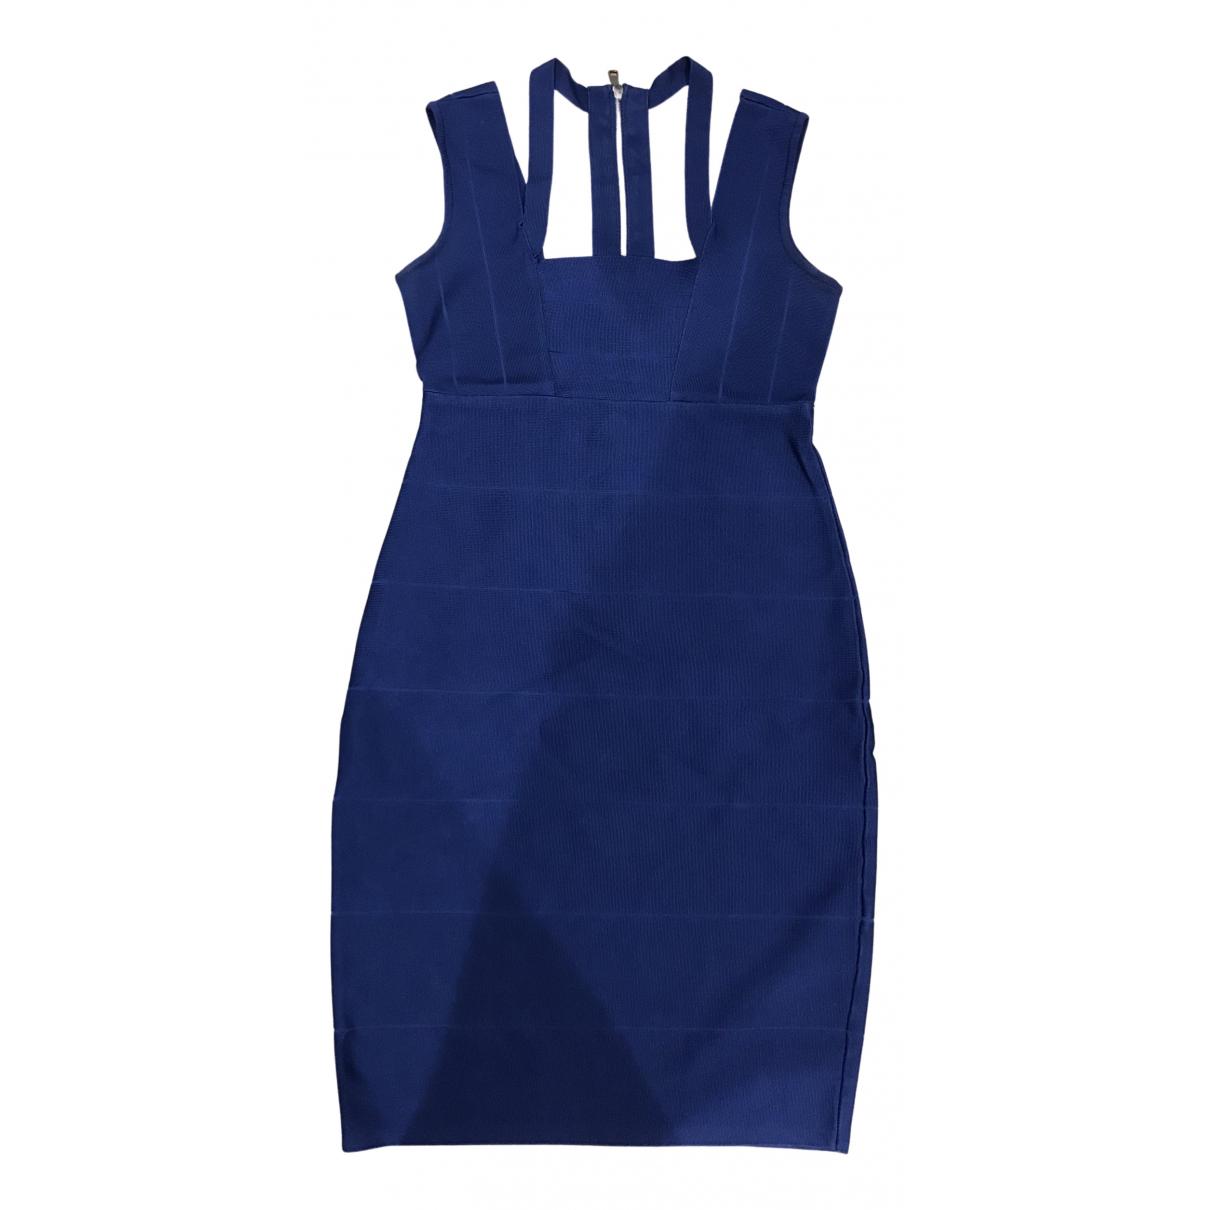 Emporio Armani \N Kleid in  Blau Polyester